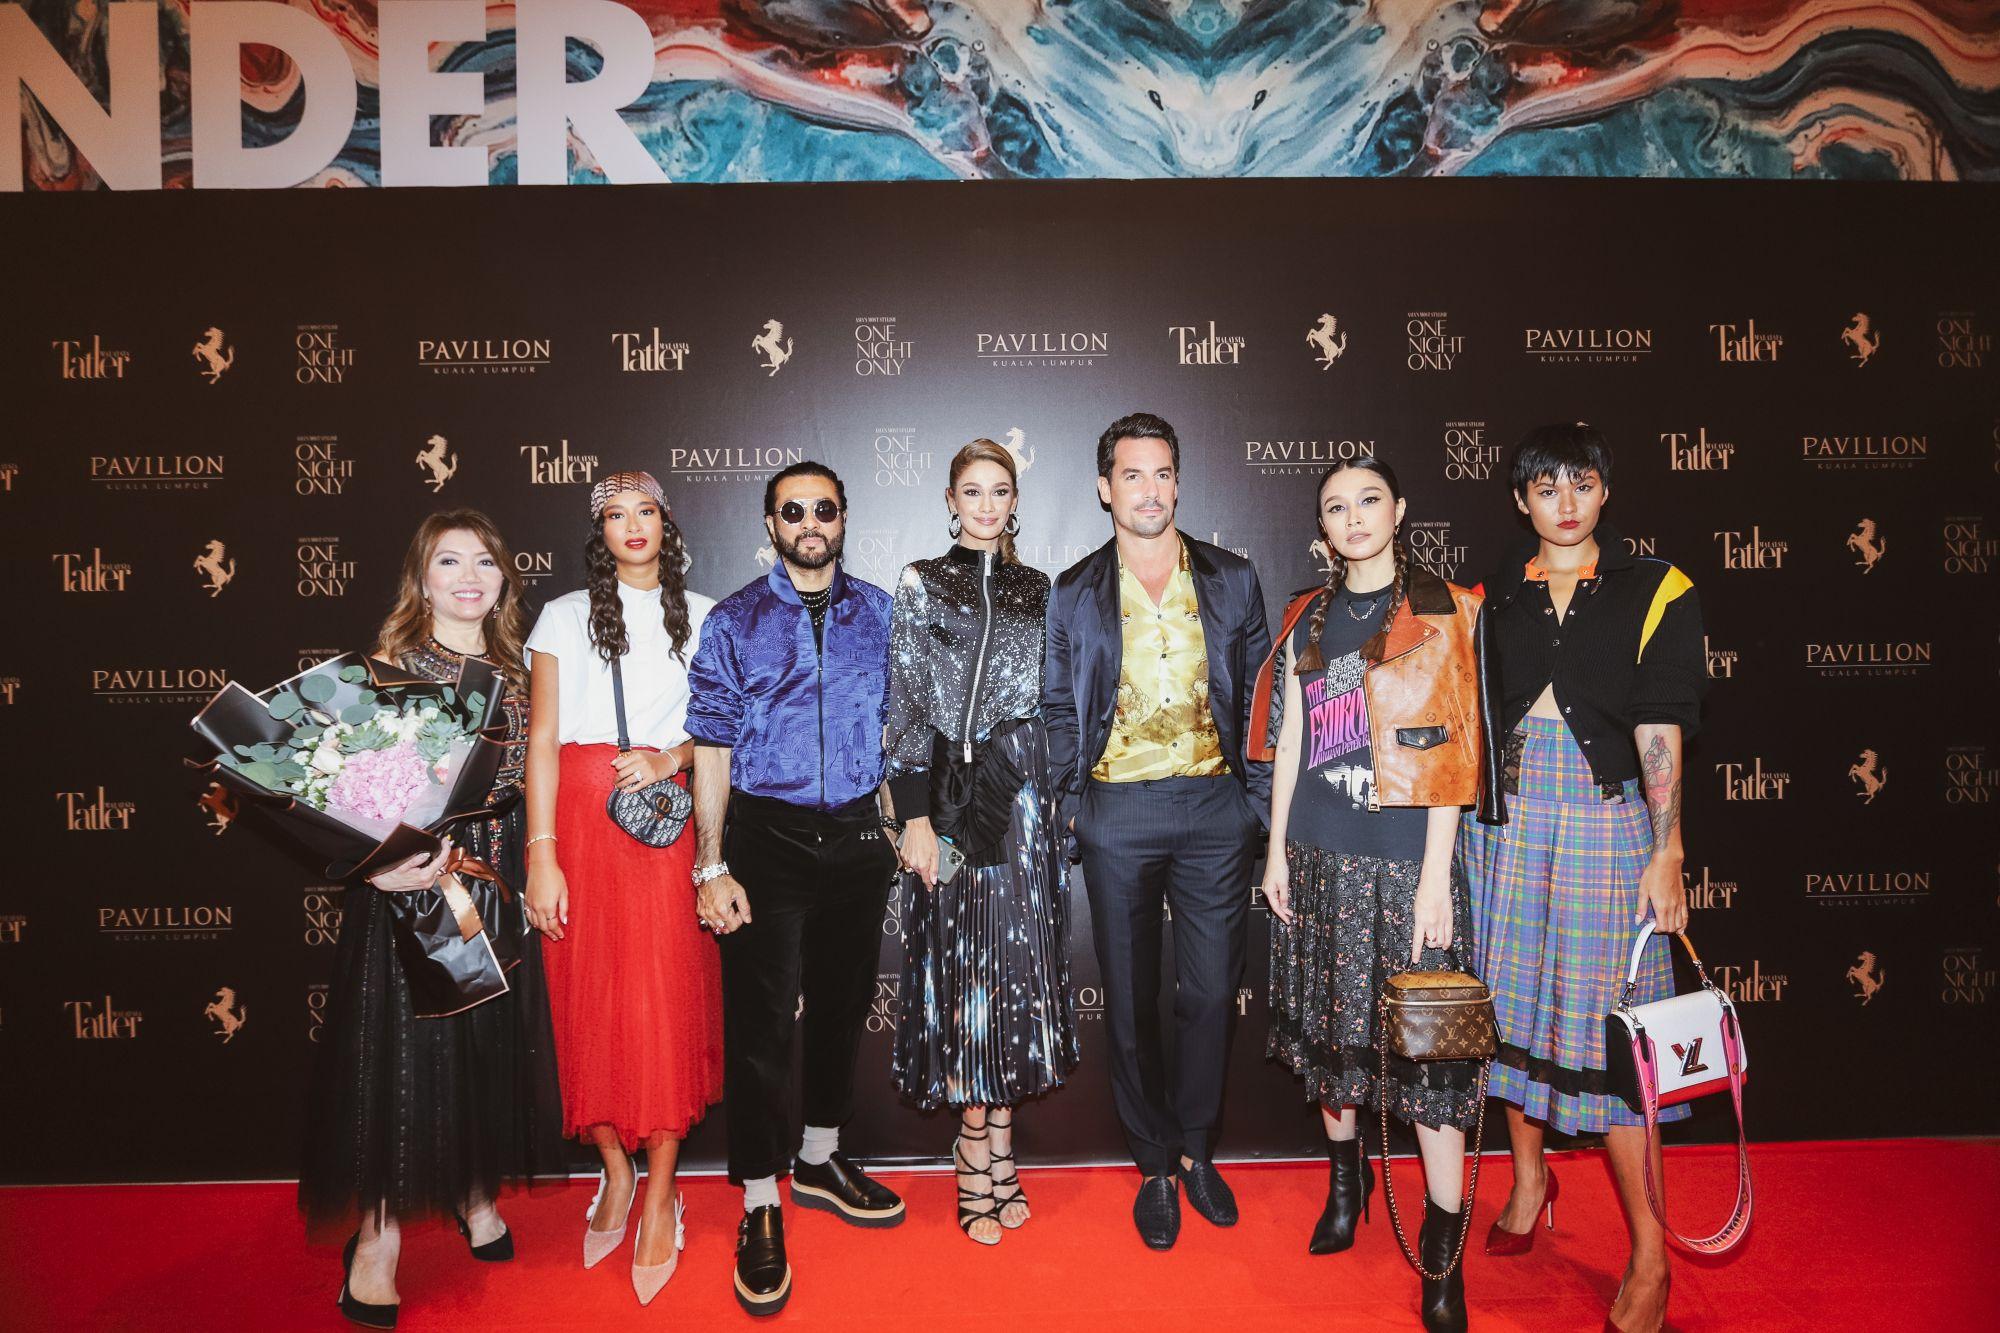 Tatler Malaysia's Most Stylish (from left): Lee Jim Leng, Ally Mukhriz, Dato' Bernard Chandran, Kavita Sidhu, Roberto Guiati, Scha Alyahya, and Alicia Amin